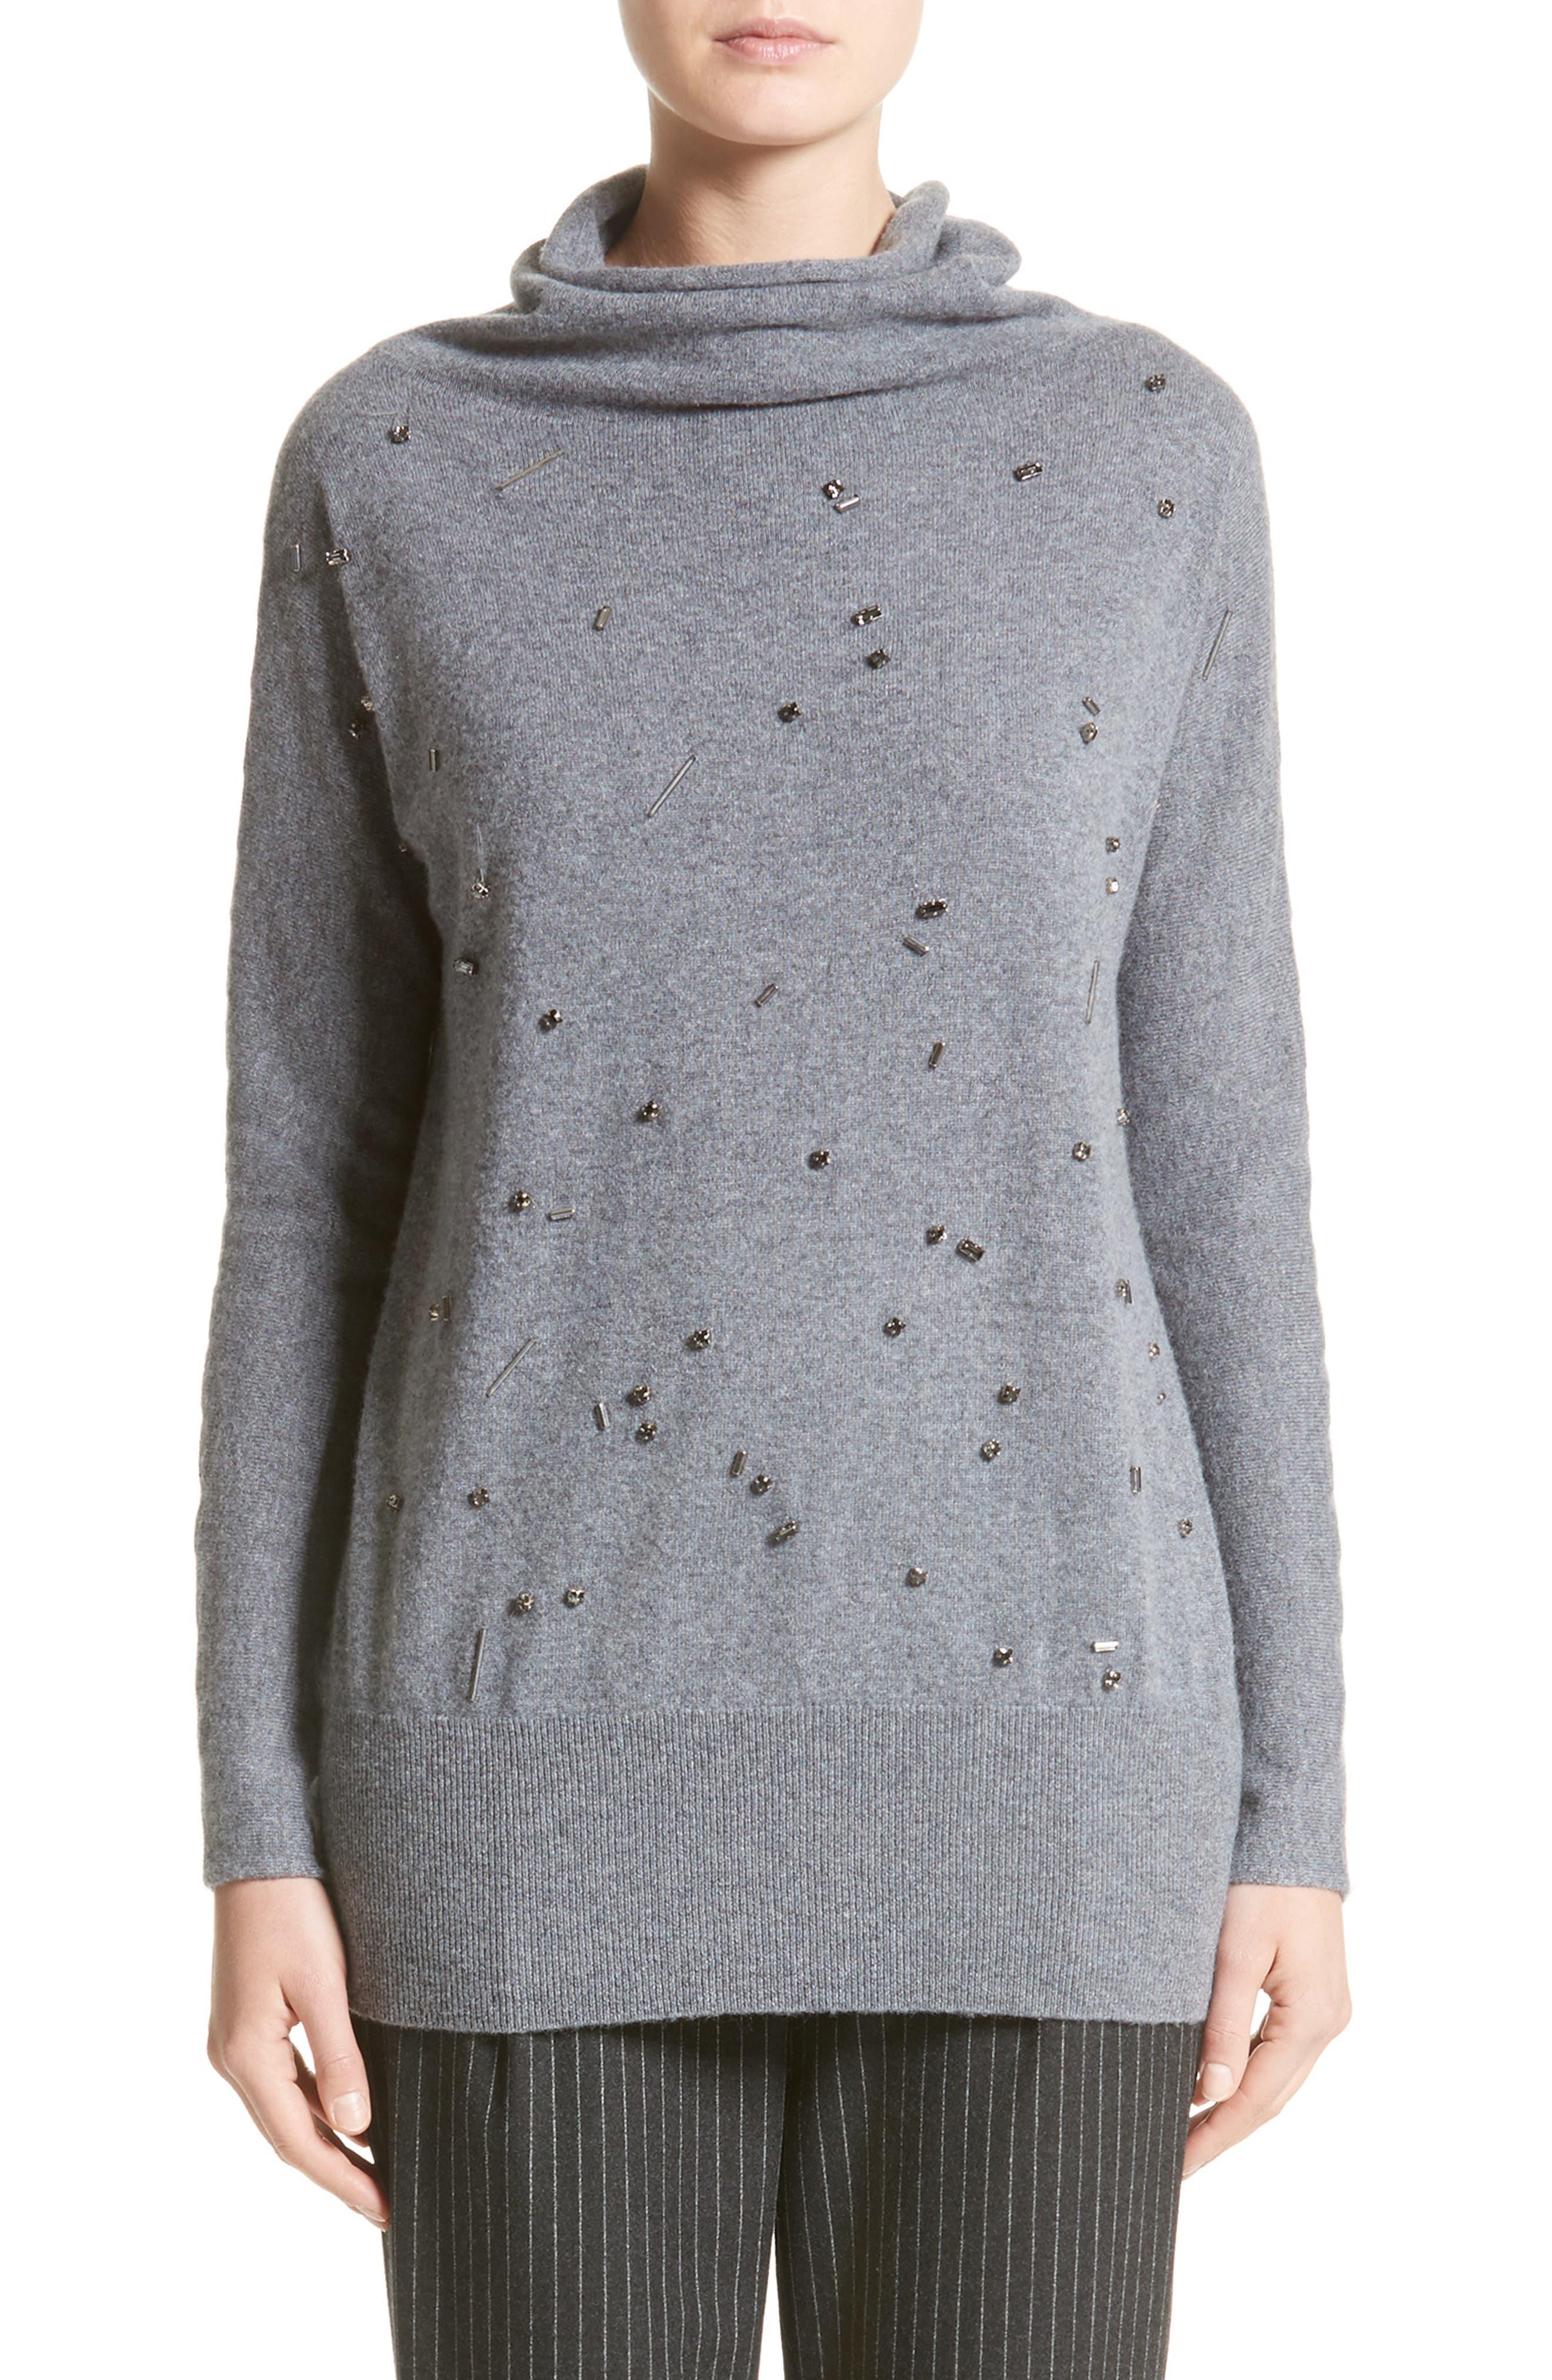 Embellished Cashmere Turtleneck Sweater,                             Main thumbnail 1, color,                             030